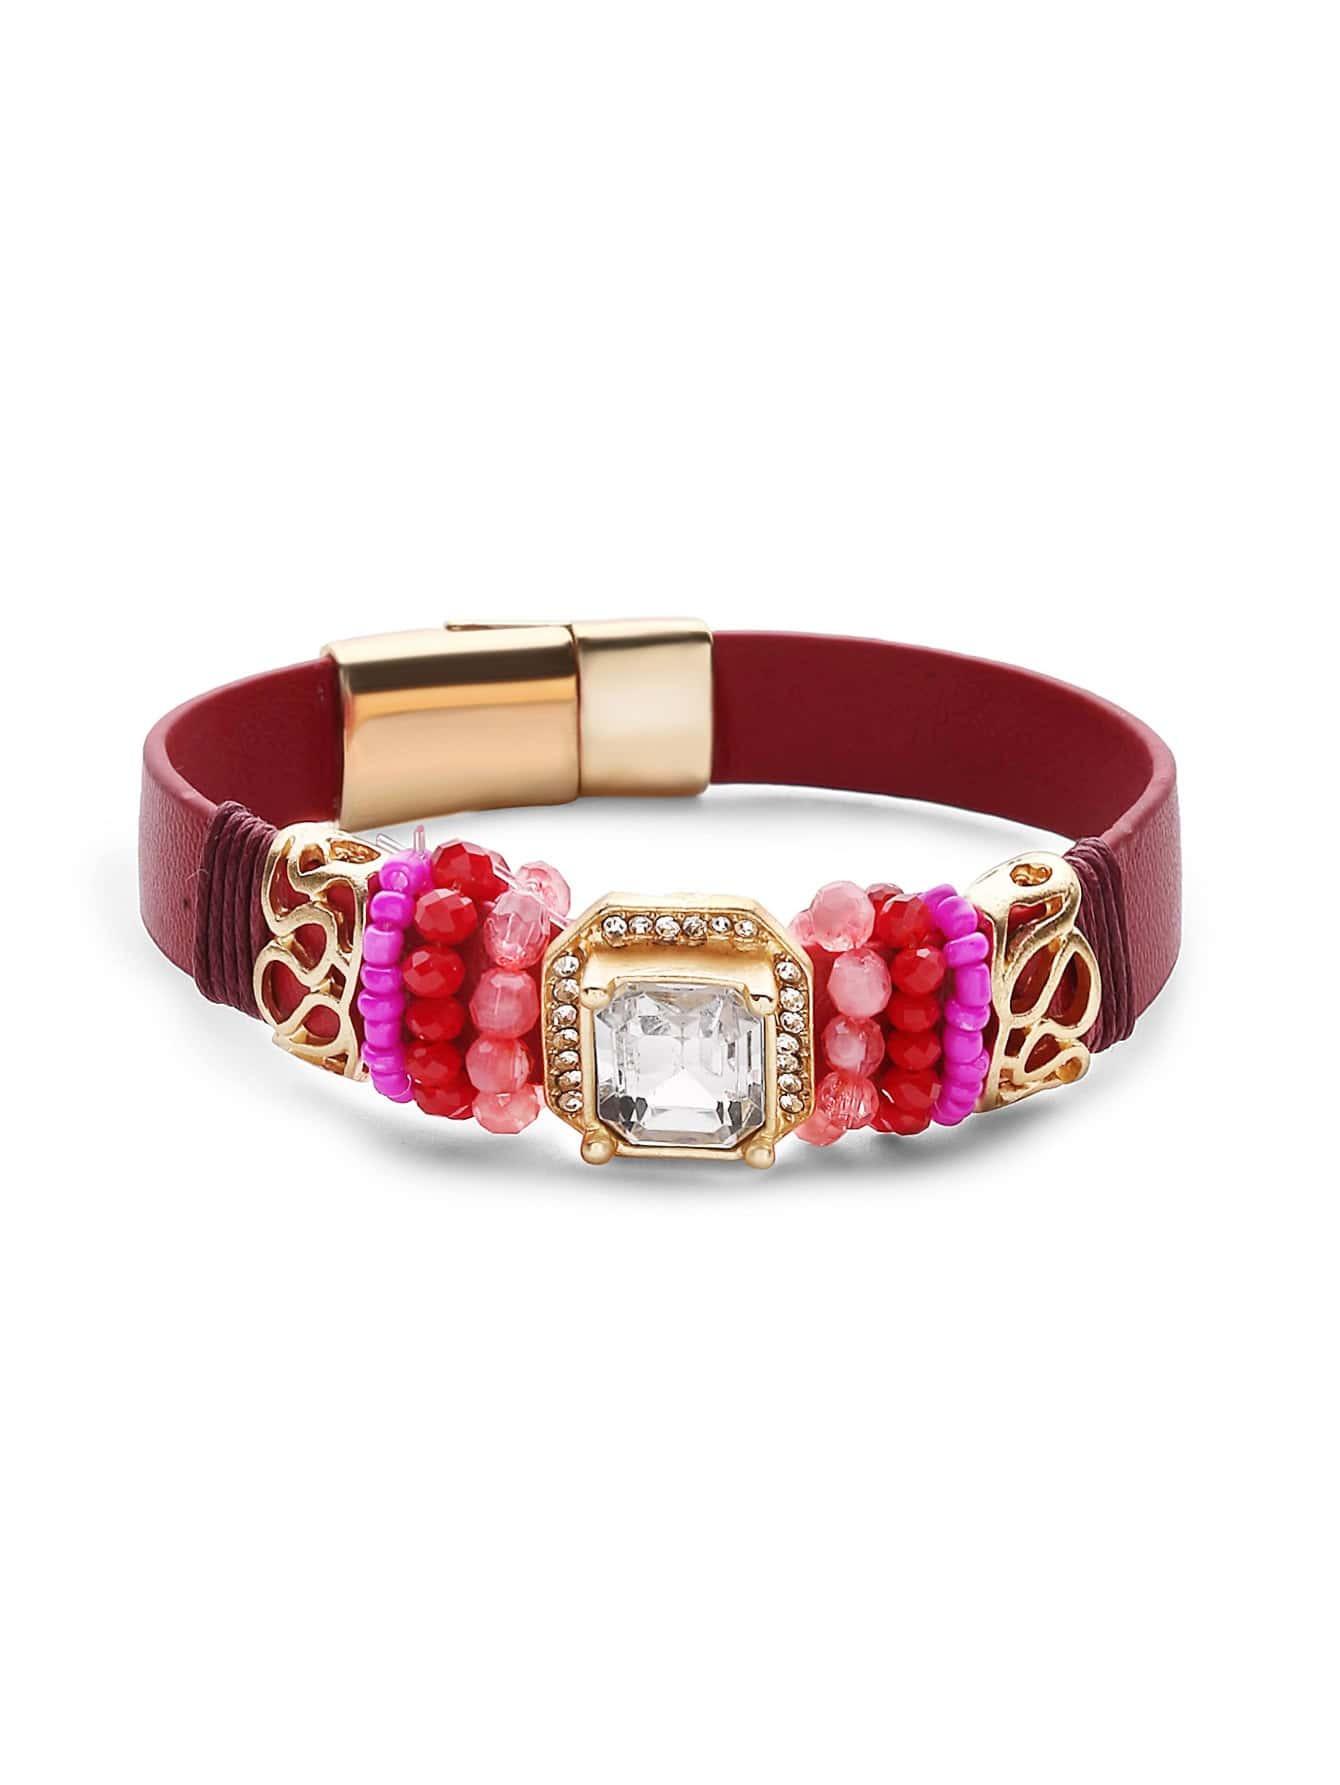 Фото Rhinestone And Beads Embellished Bracelet. Купить с доставкой